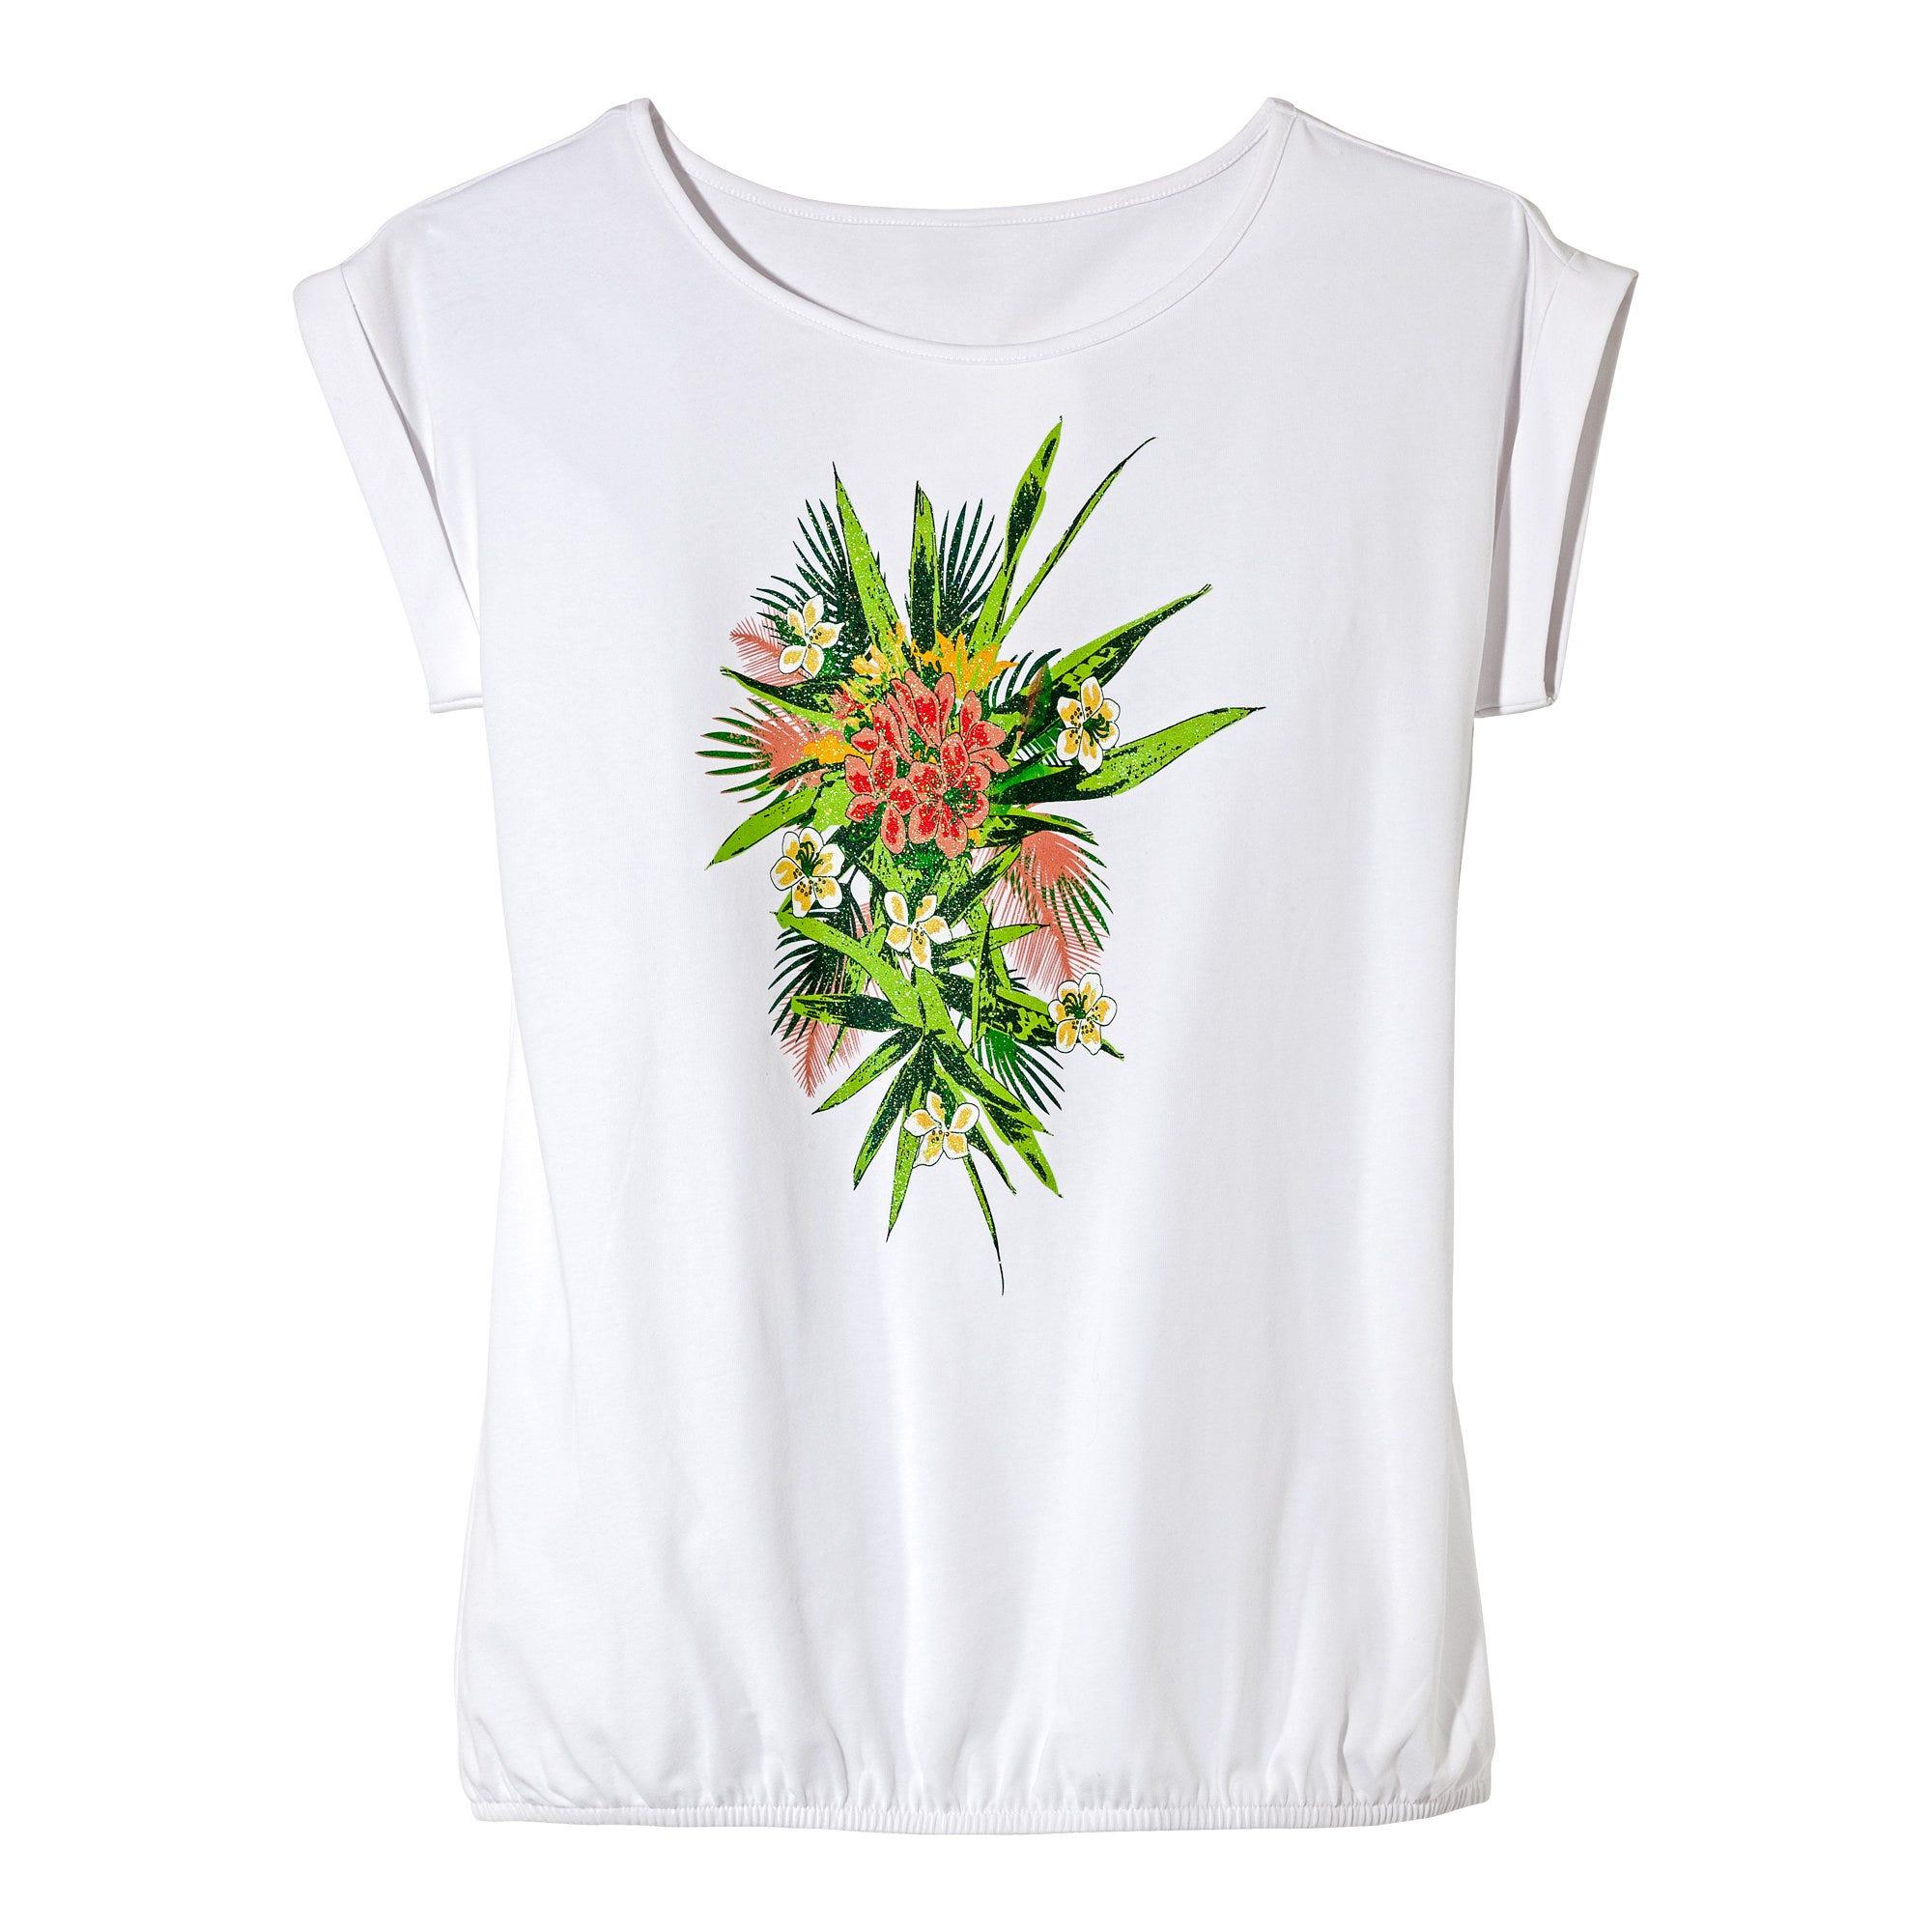 ITALY Damen Shirt Print LOVE Leo Basic T-Shirt Weiß Bunt 40//42 NEU